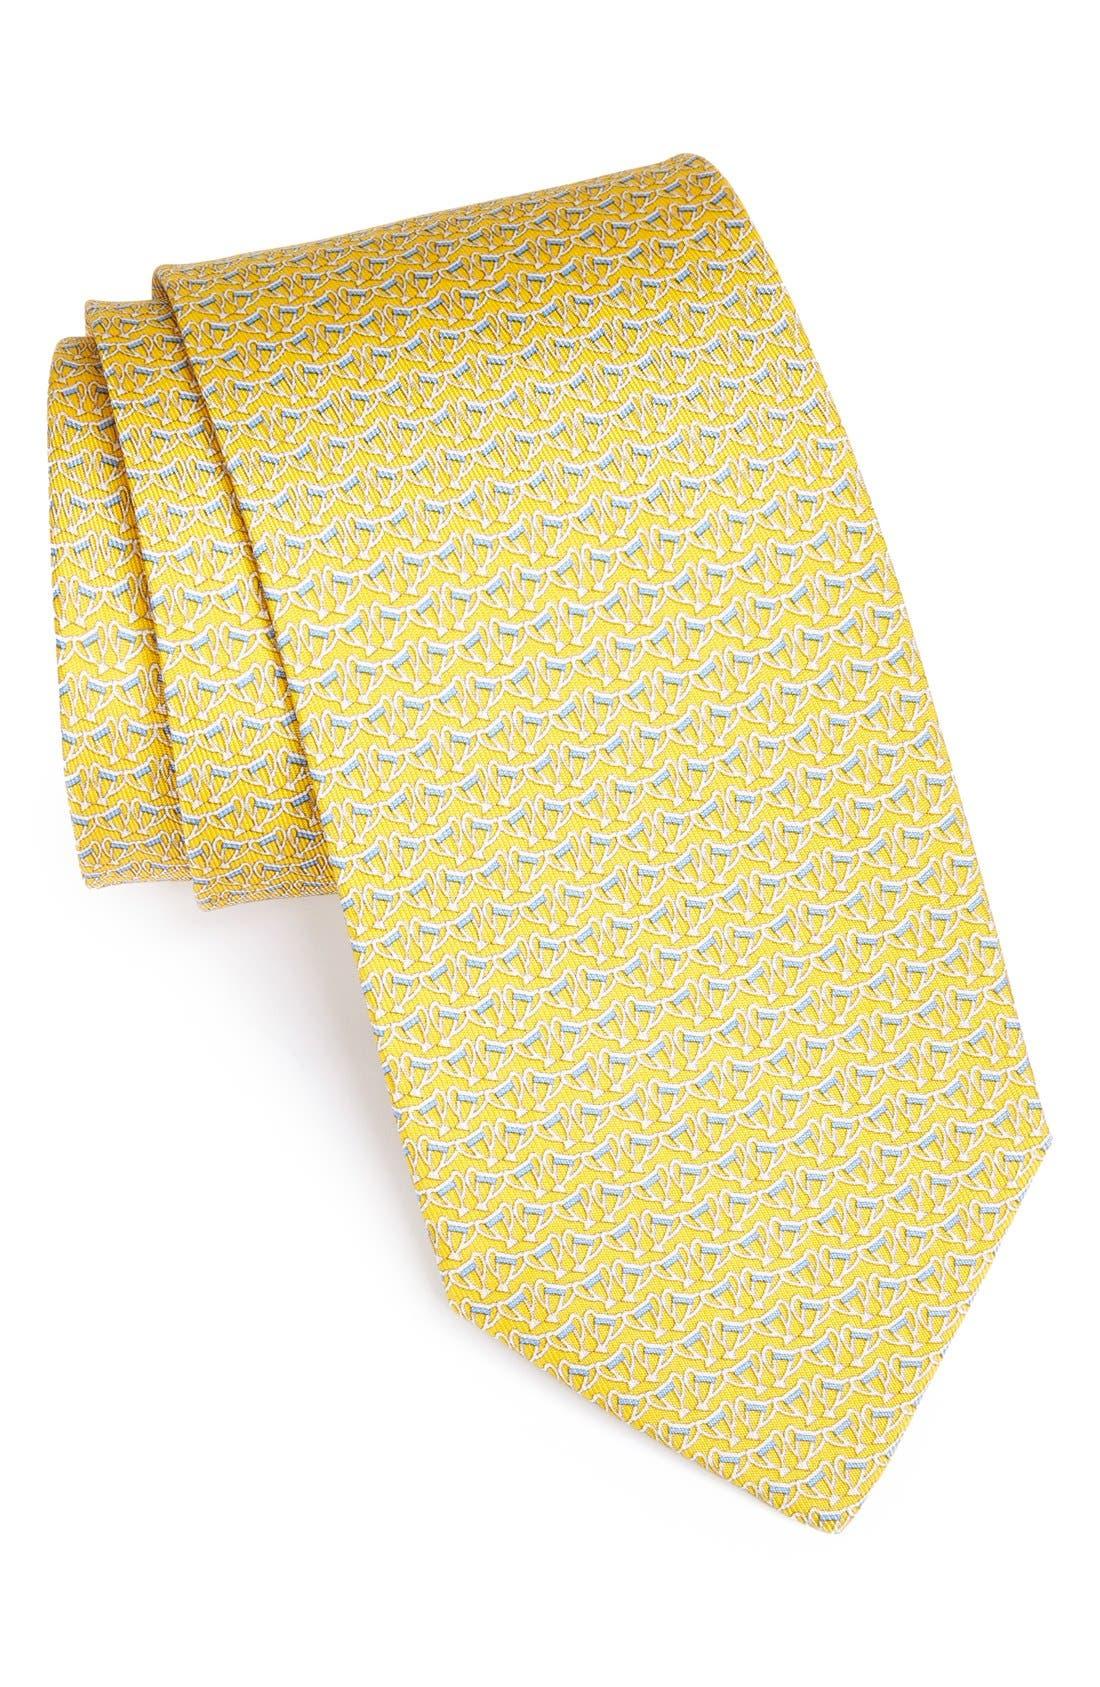 Alternate Image 1 Selected - Salvatore Ferragamo Cup Print Tie